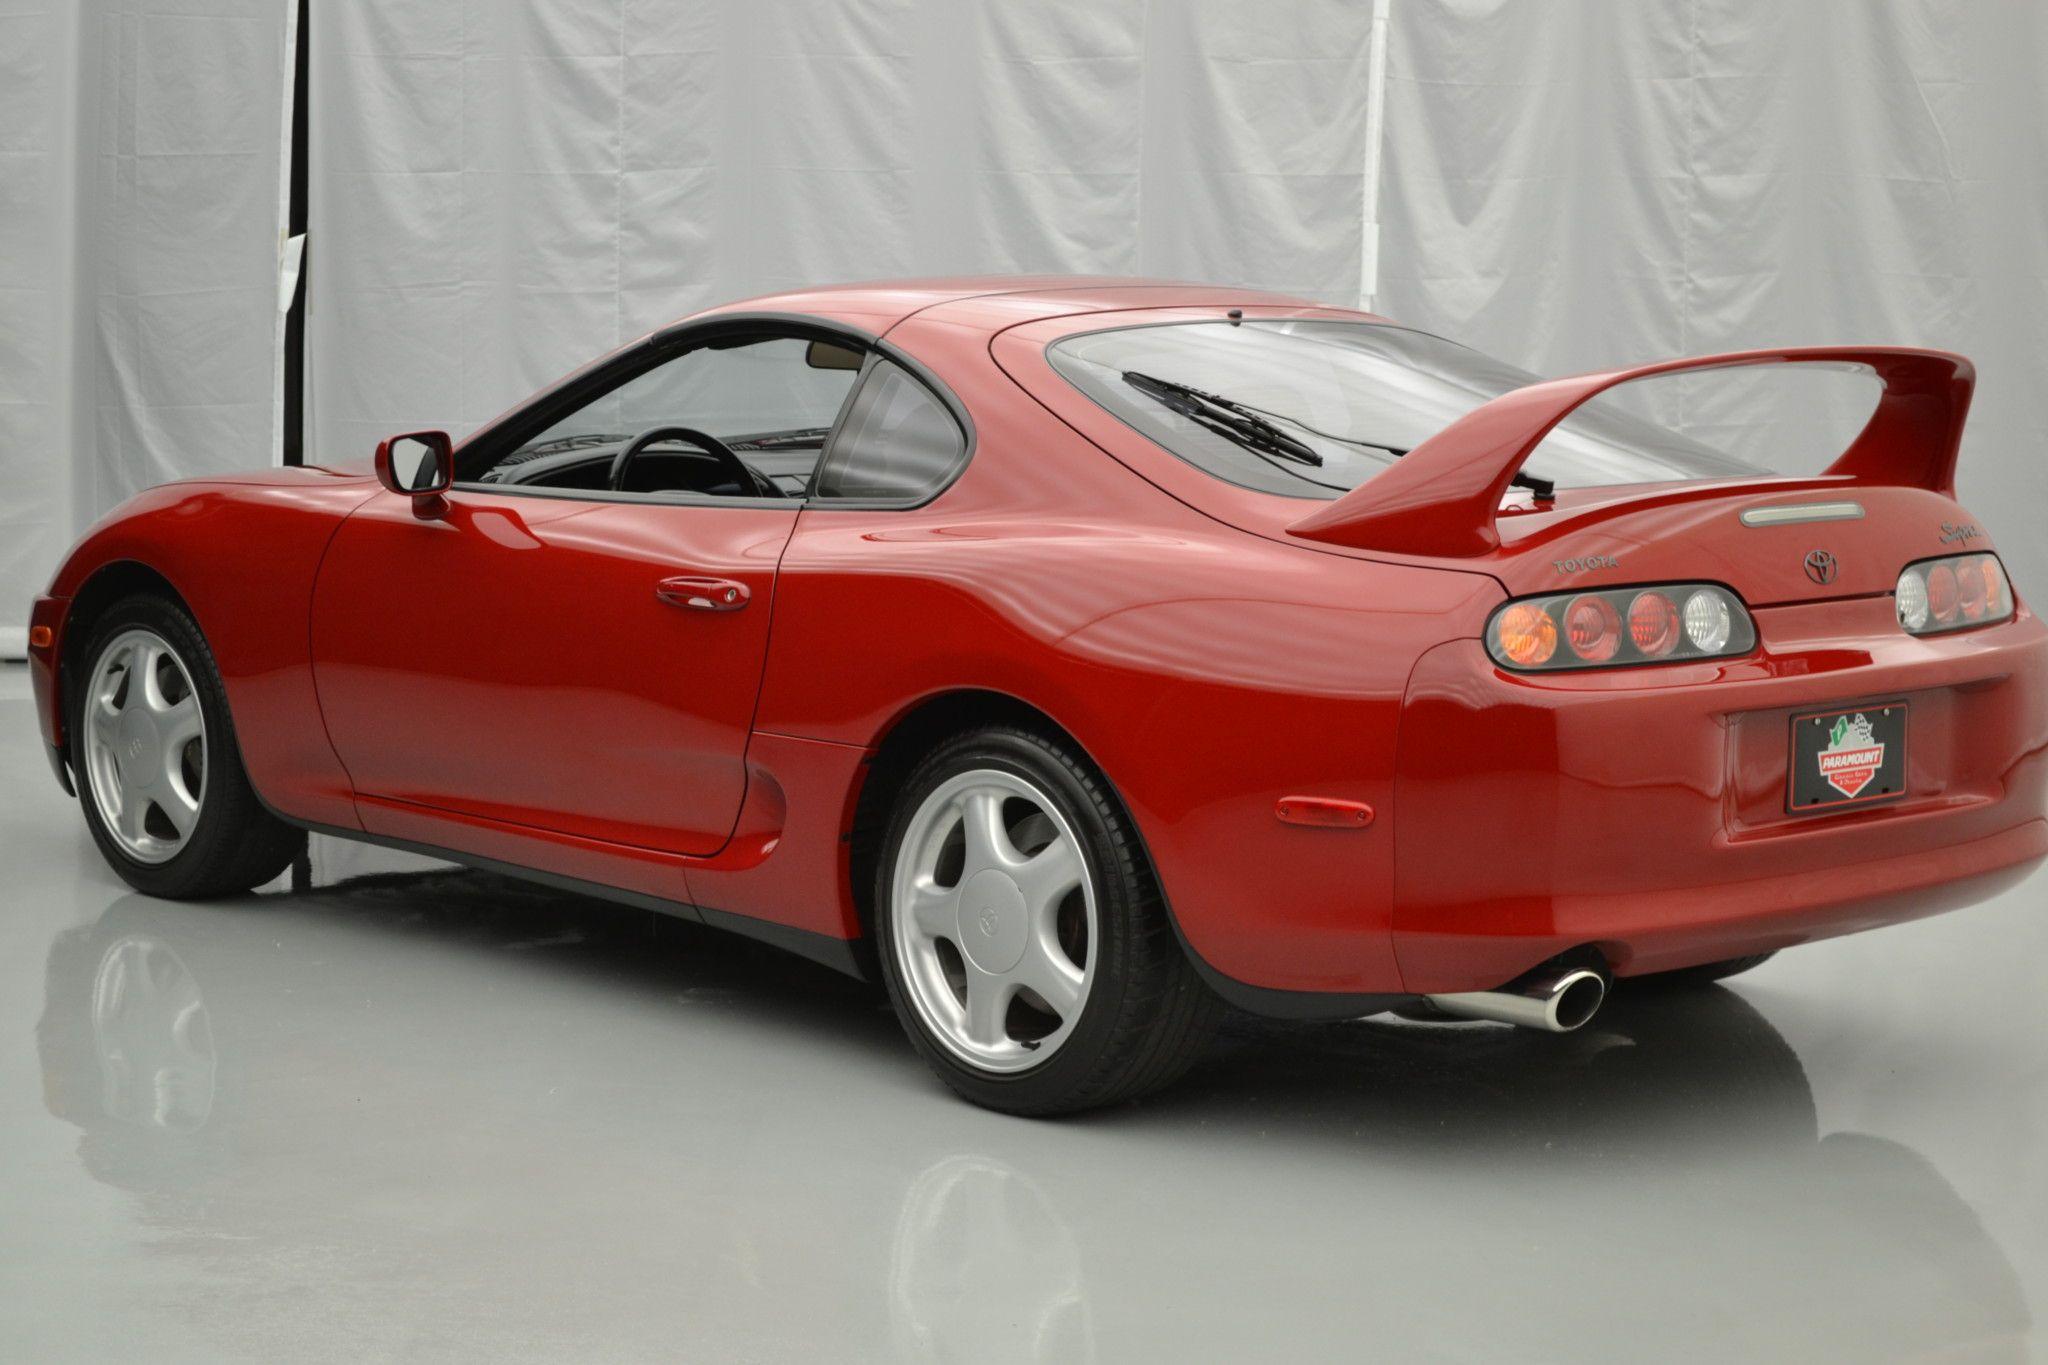 4a7e5af2a5d5 7000-Mile Supra Turbo Sells for  121